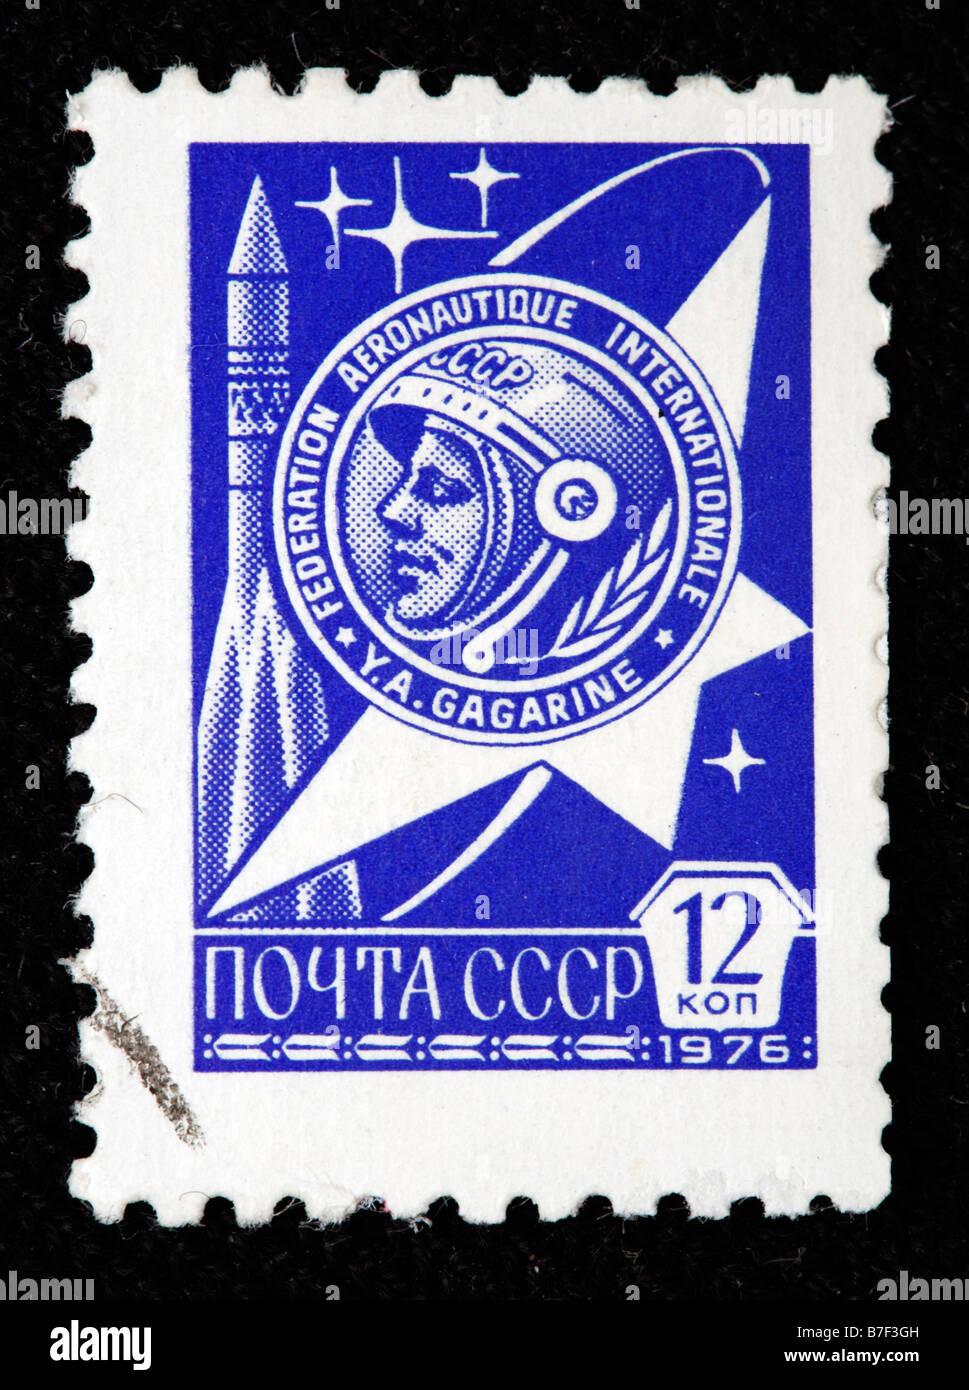 International aeronautic federation, Yuri Gagarin, postage stamp, USSR, 1976 - Stock Image